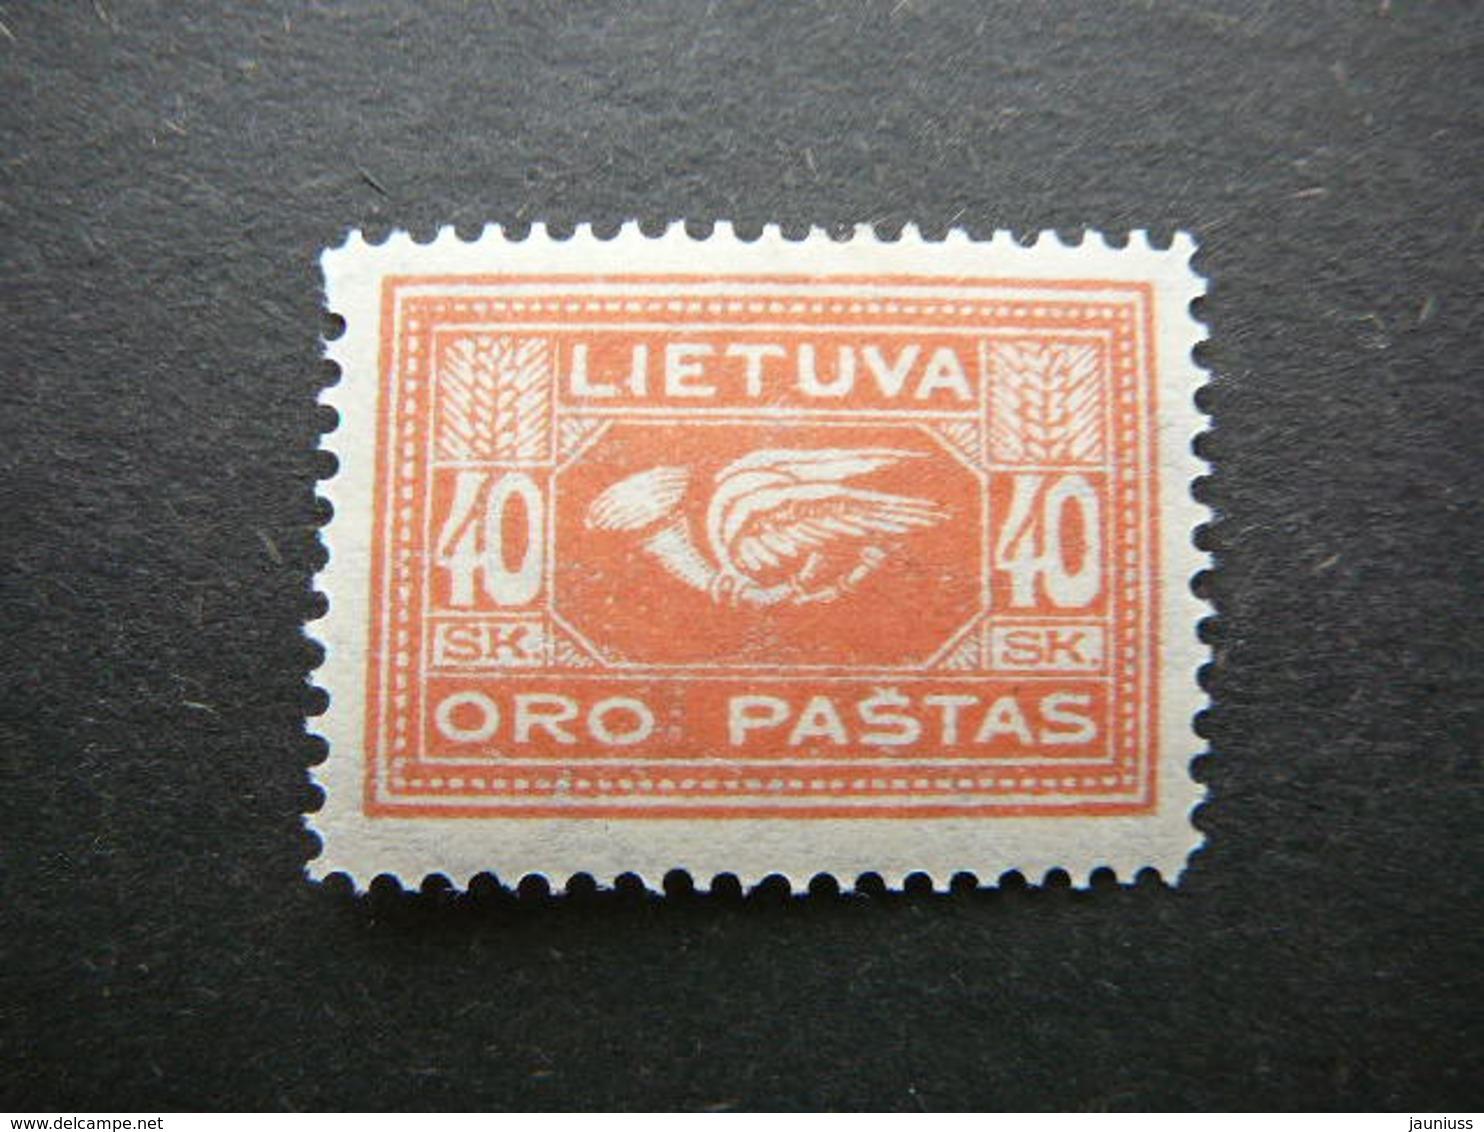 Lietuva Lithuania Litauen Lituanie Litouwen # 1921 MH # Mi. 103 Planes. Airmail - Lithuania